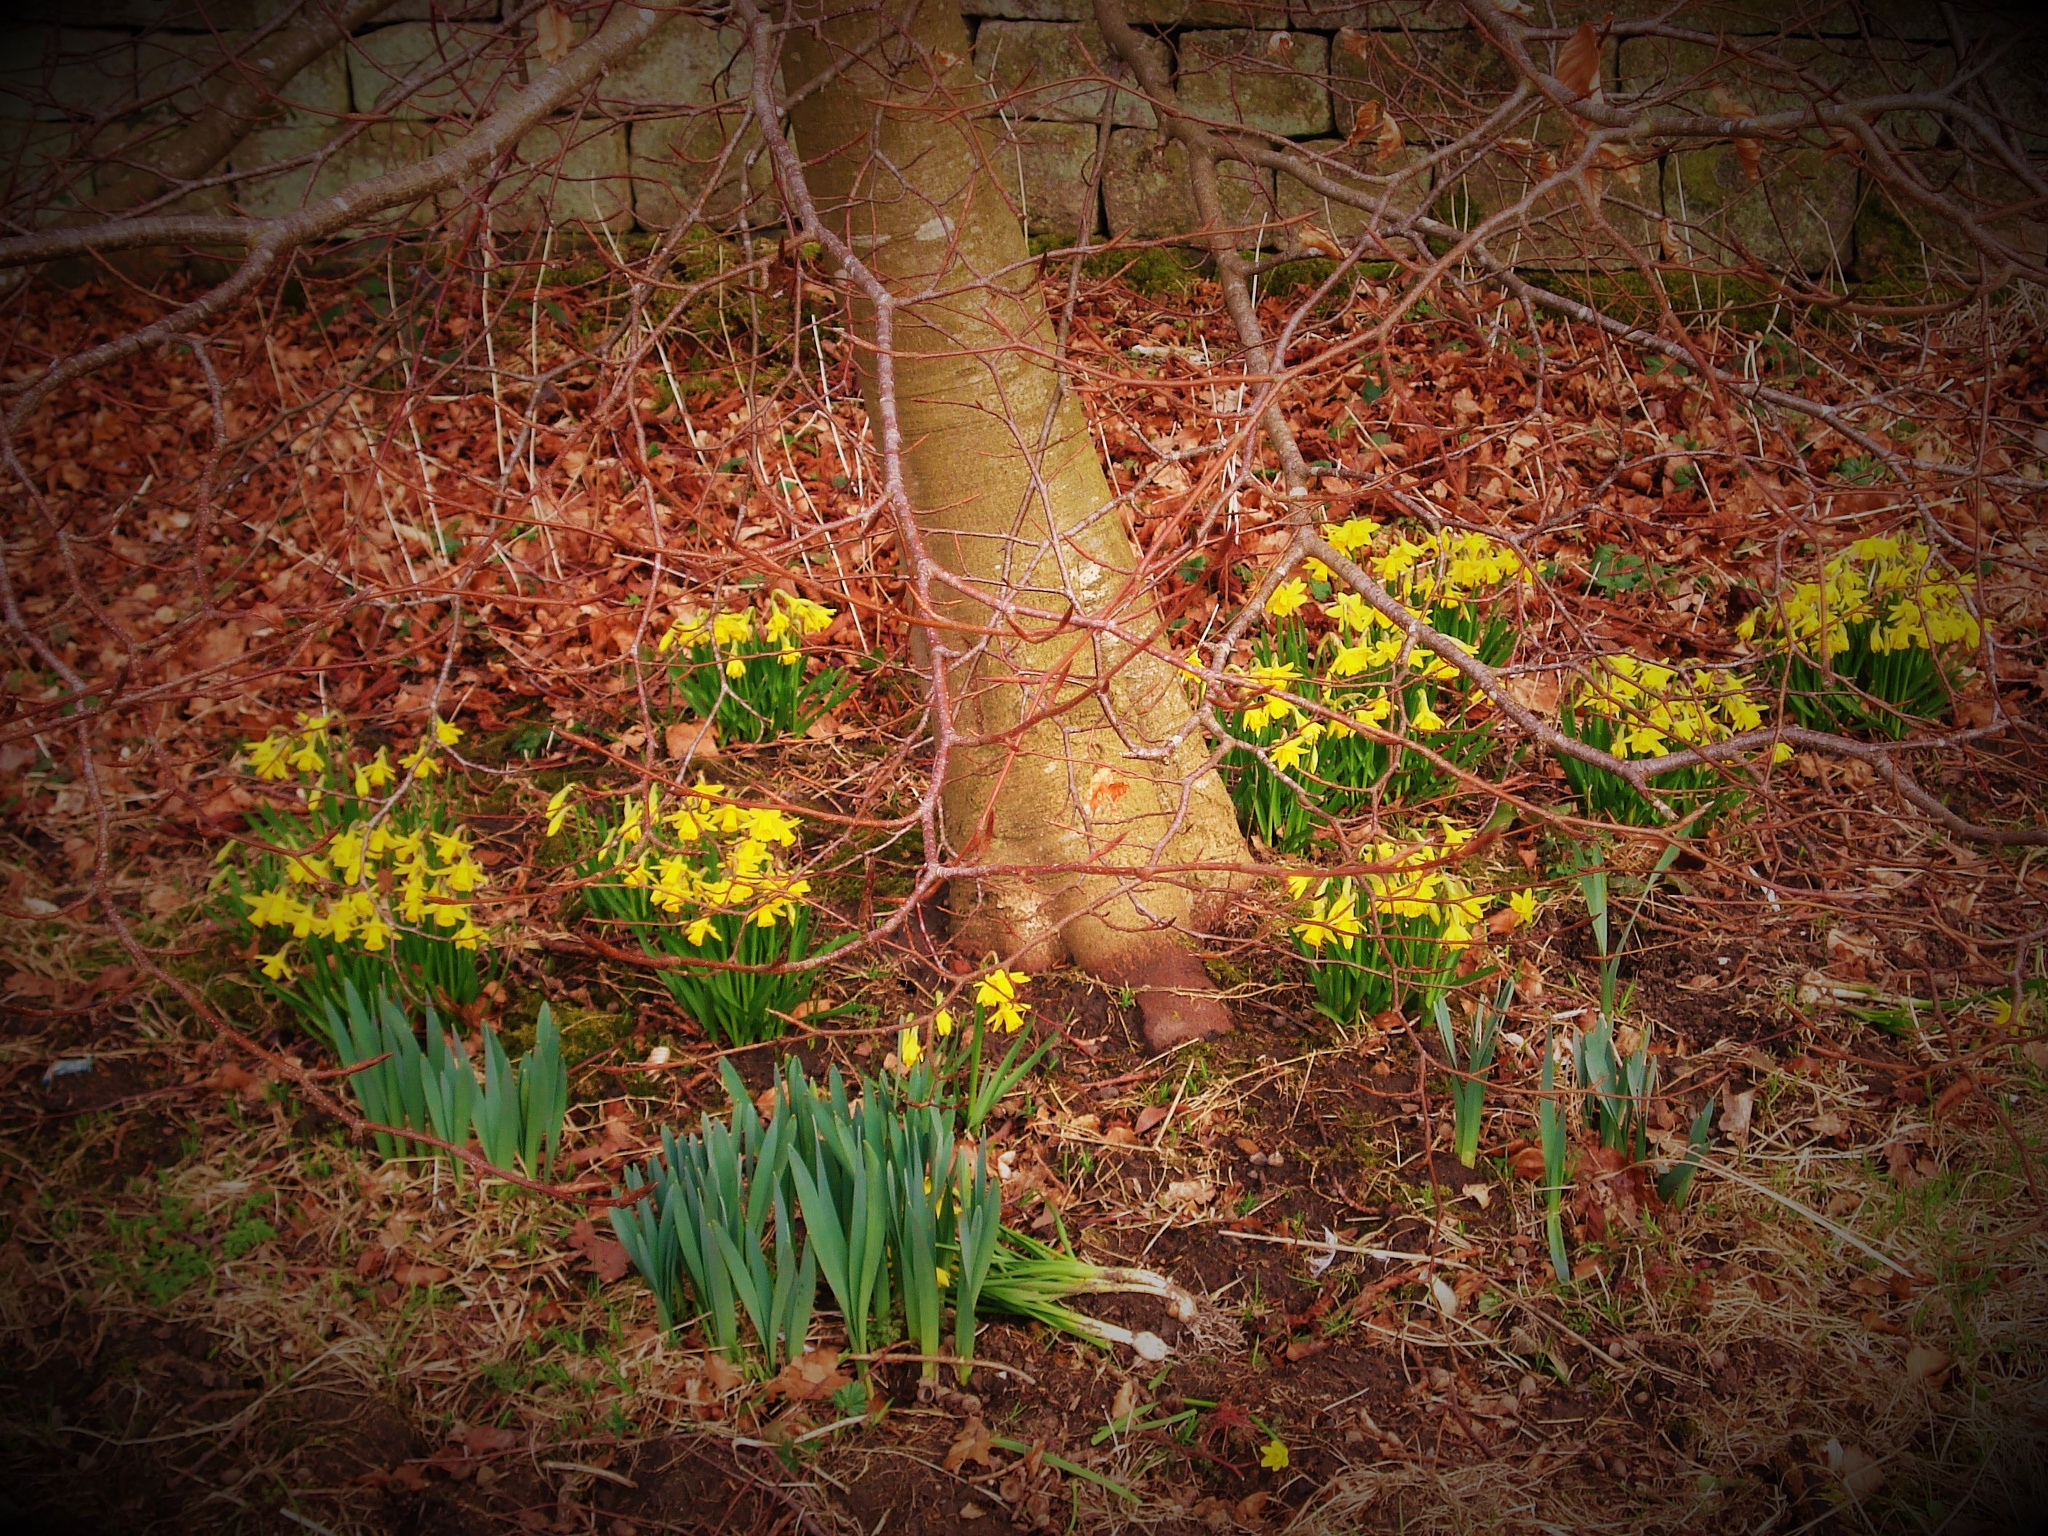 Spring Dafodils by colin.savidge